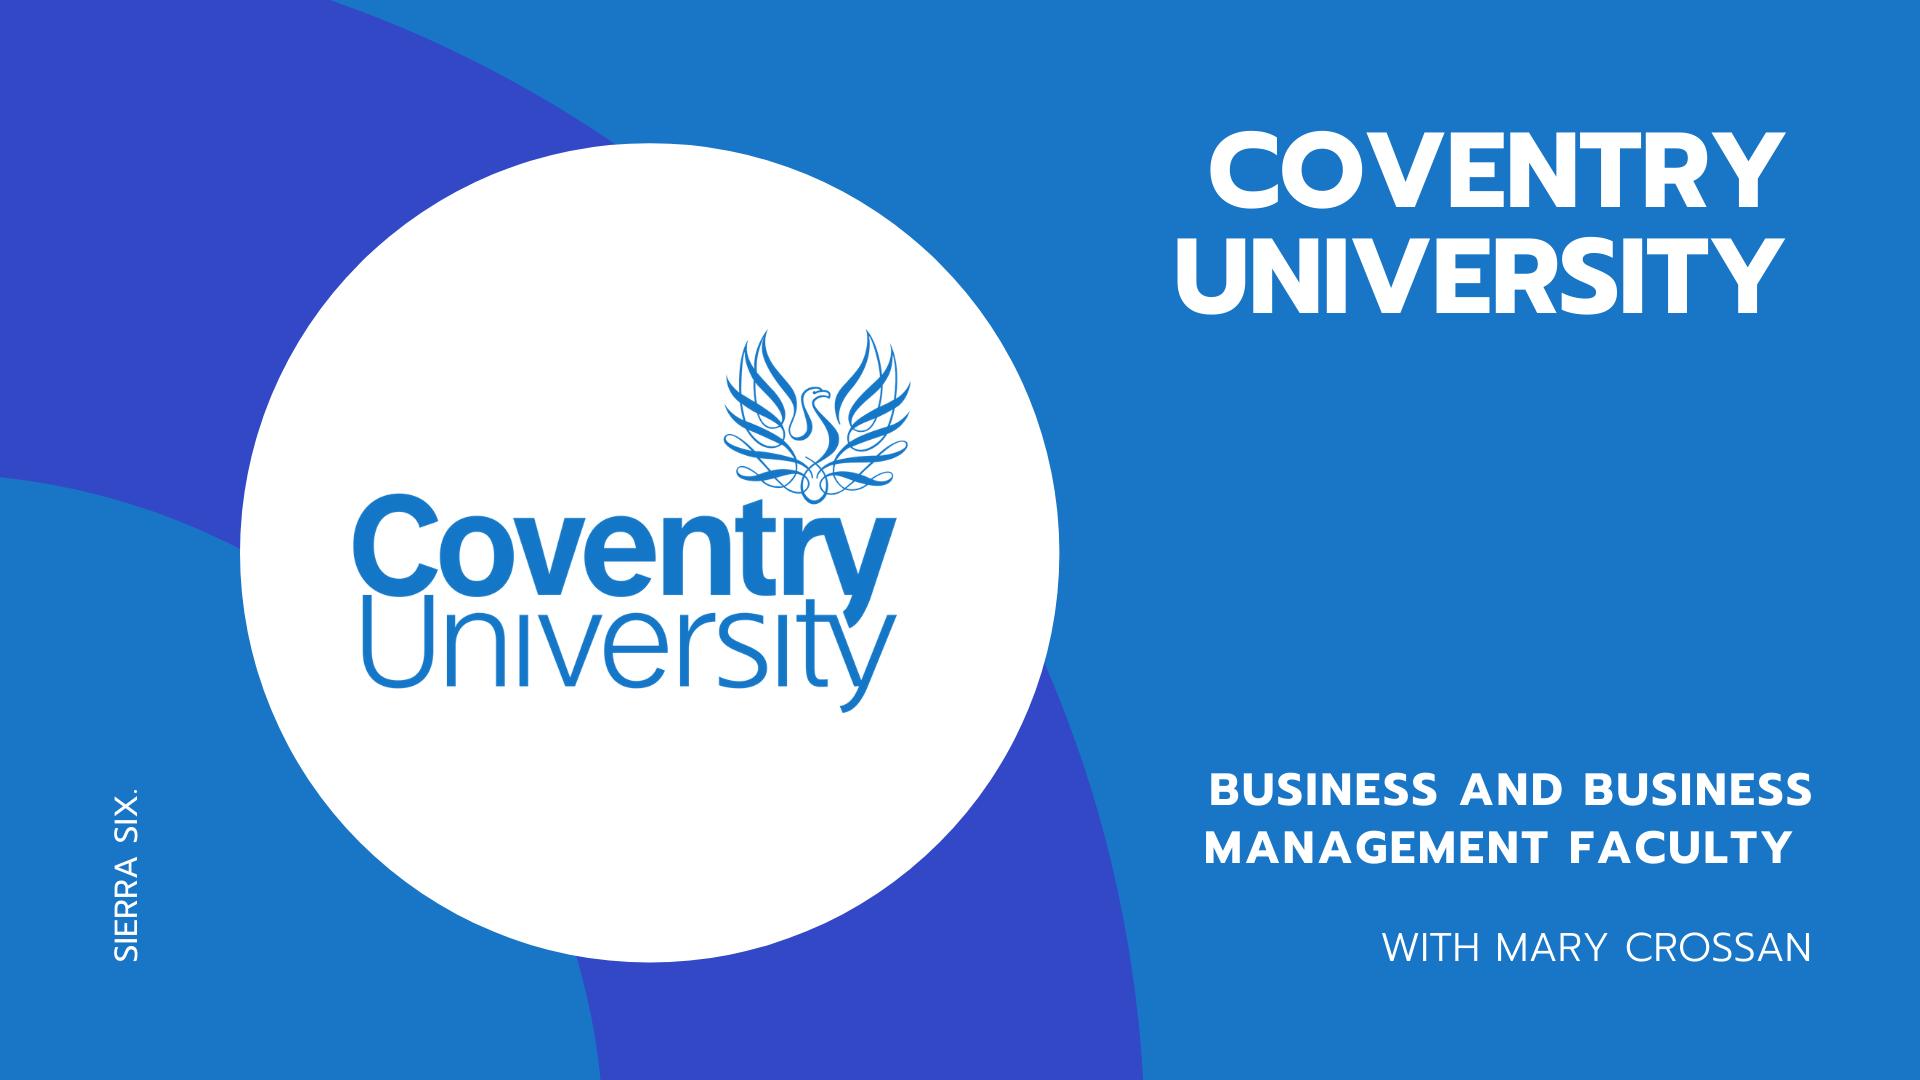 Sierra Six Media, SEO agency educational workshops: Coventry University